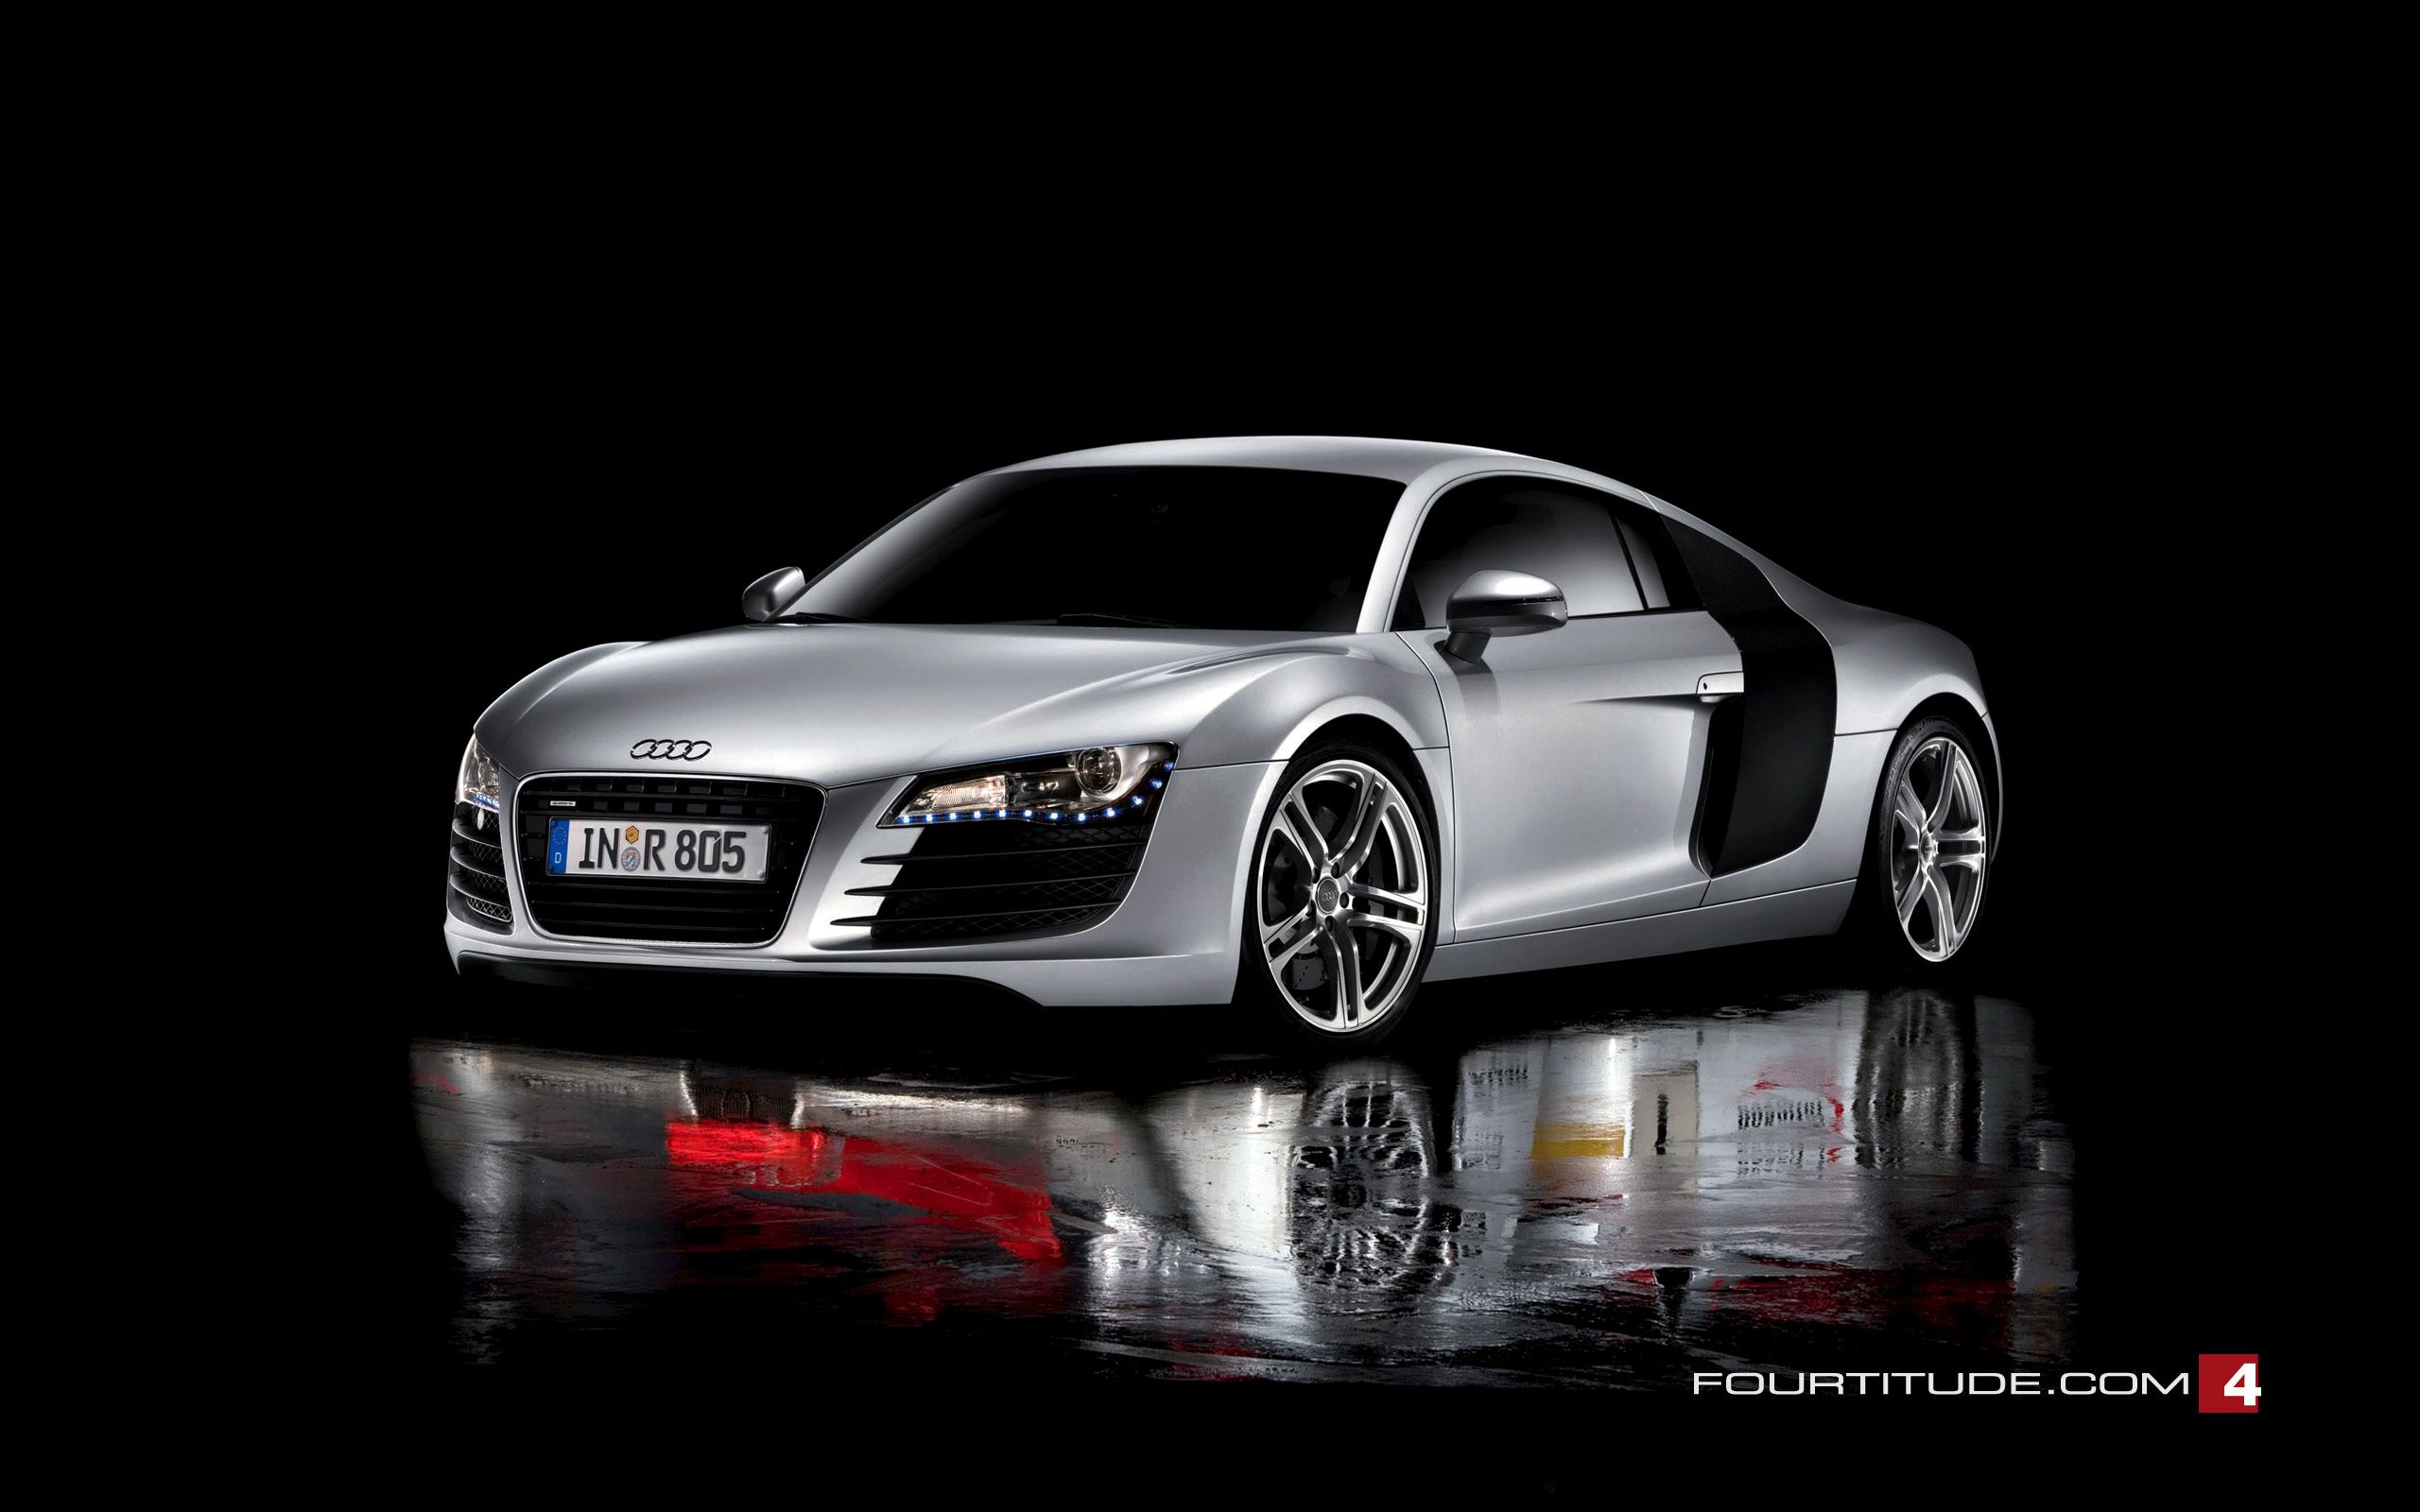 Audi Wallpaper Cars Httphdcarwallfxcomaudiwallpapercars - Audi r8 suv price